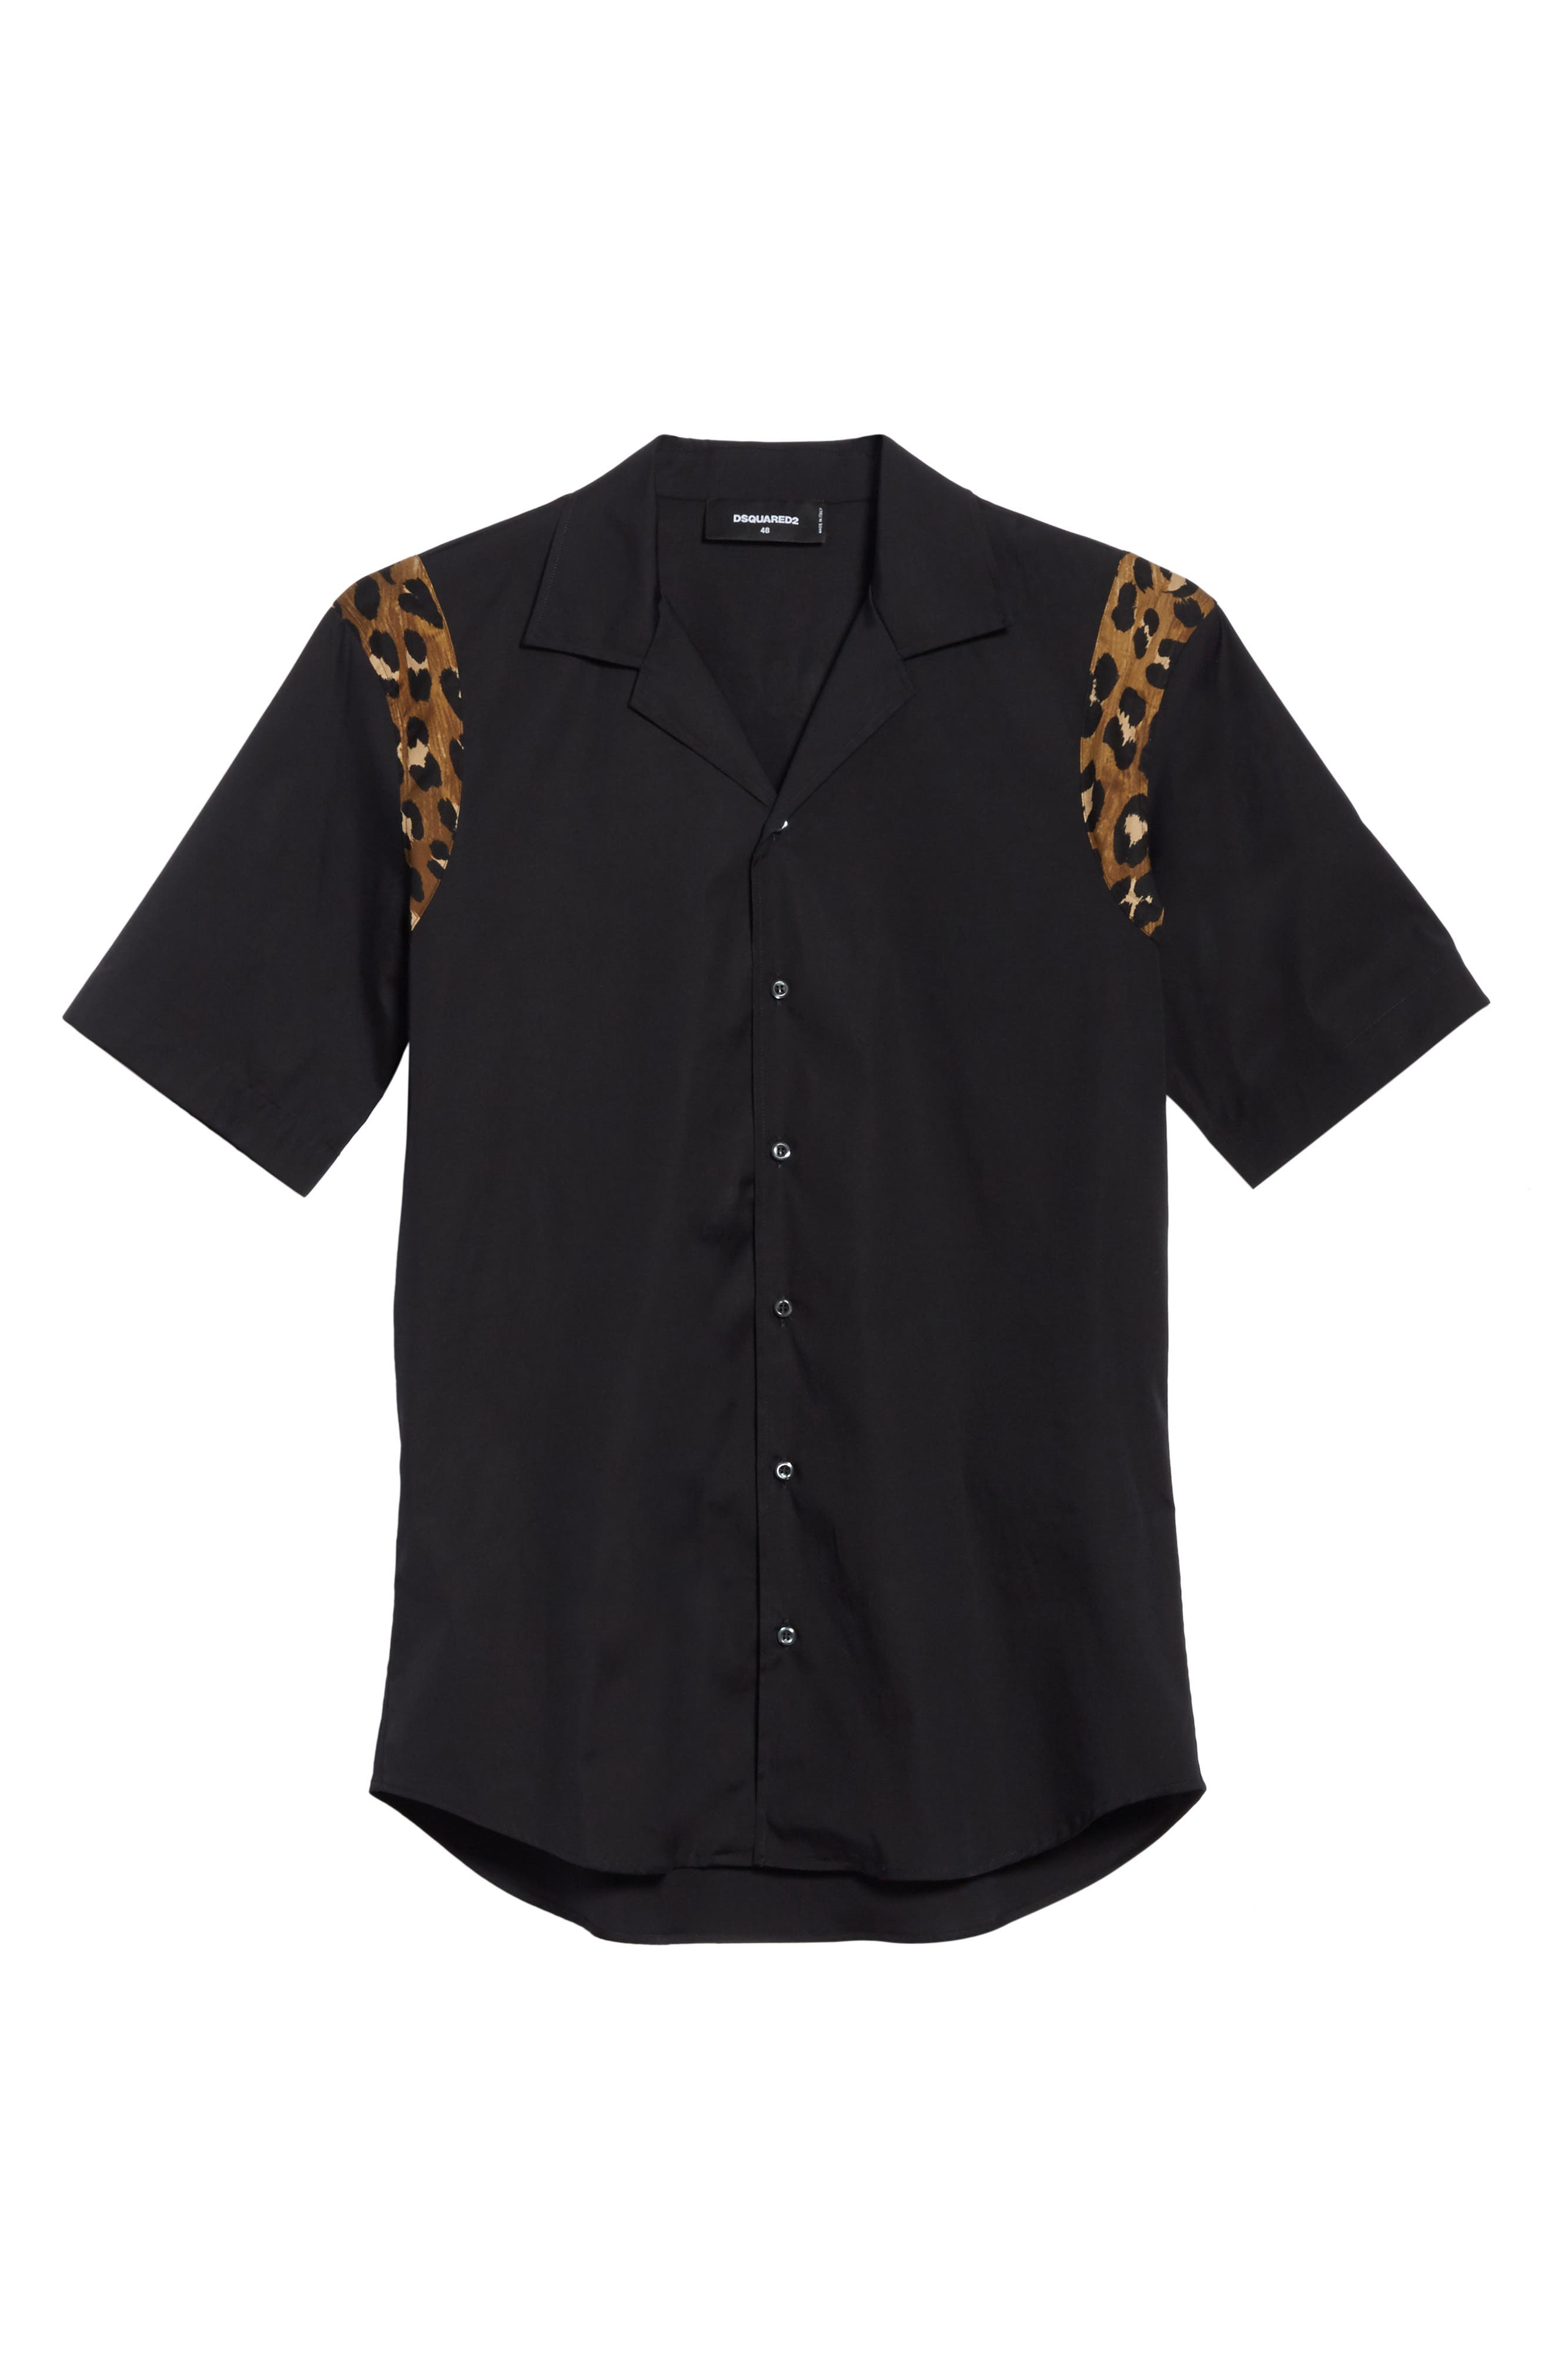 Bowling Shirt,                             Alternate thumbnail 6, color,                             Black